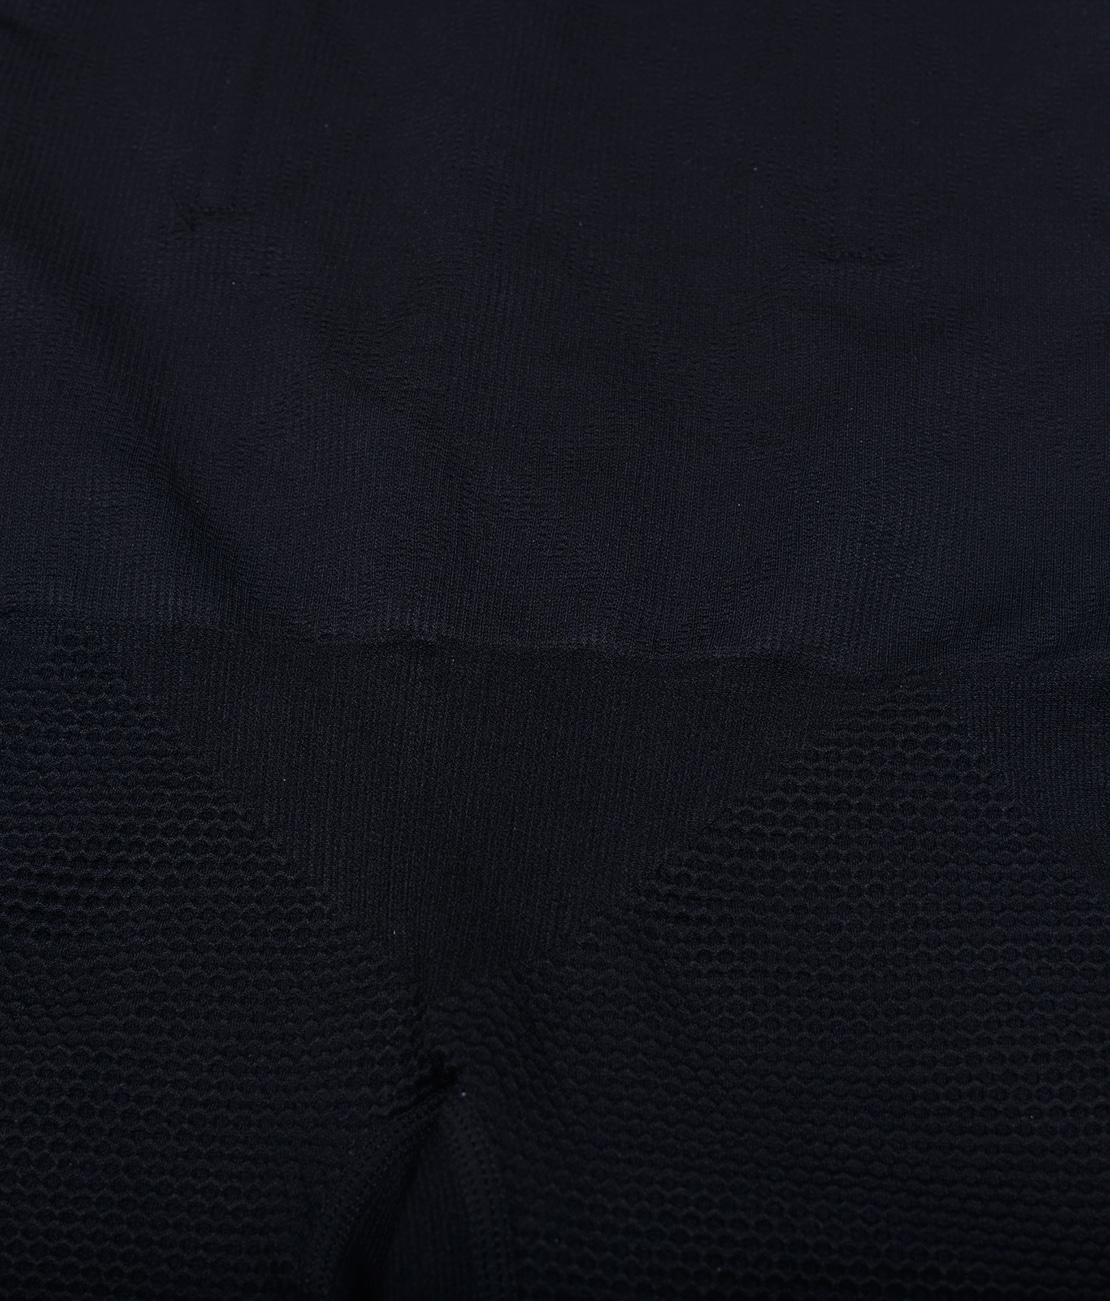 Panty Nid d'abeille Noir Packshot Detail 2